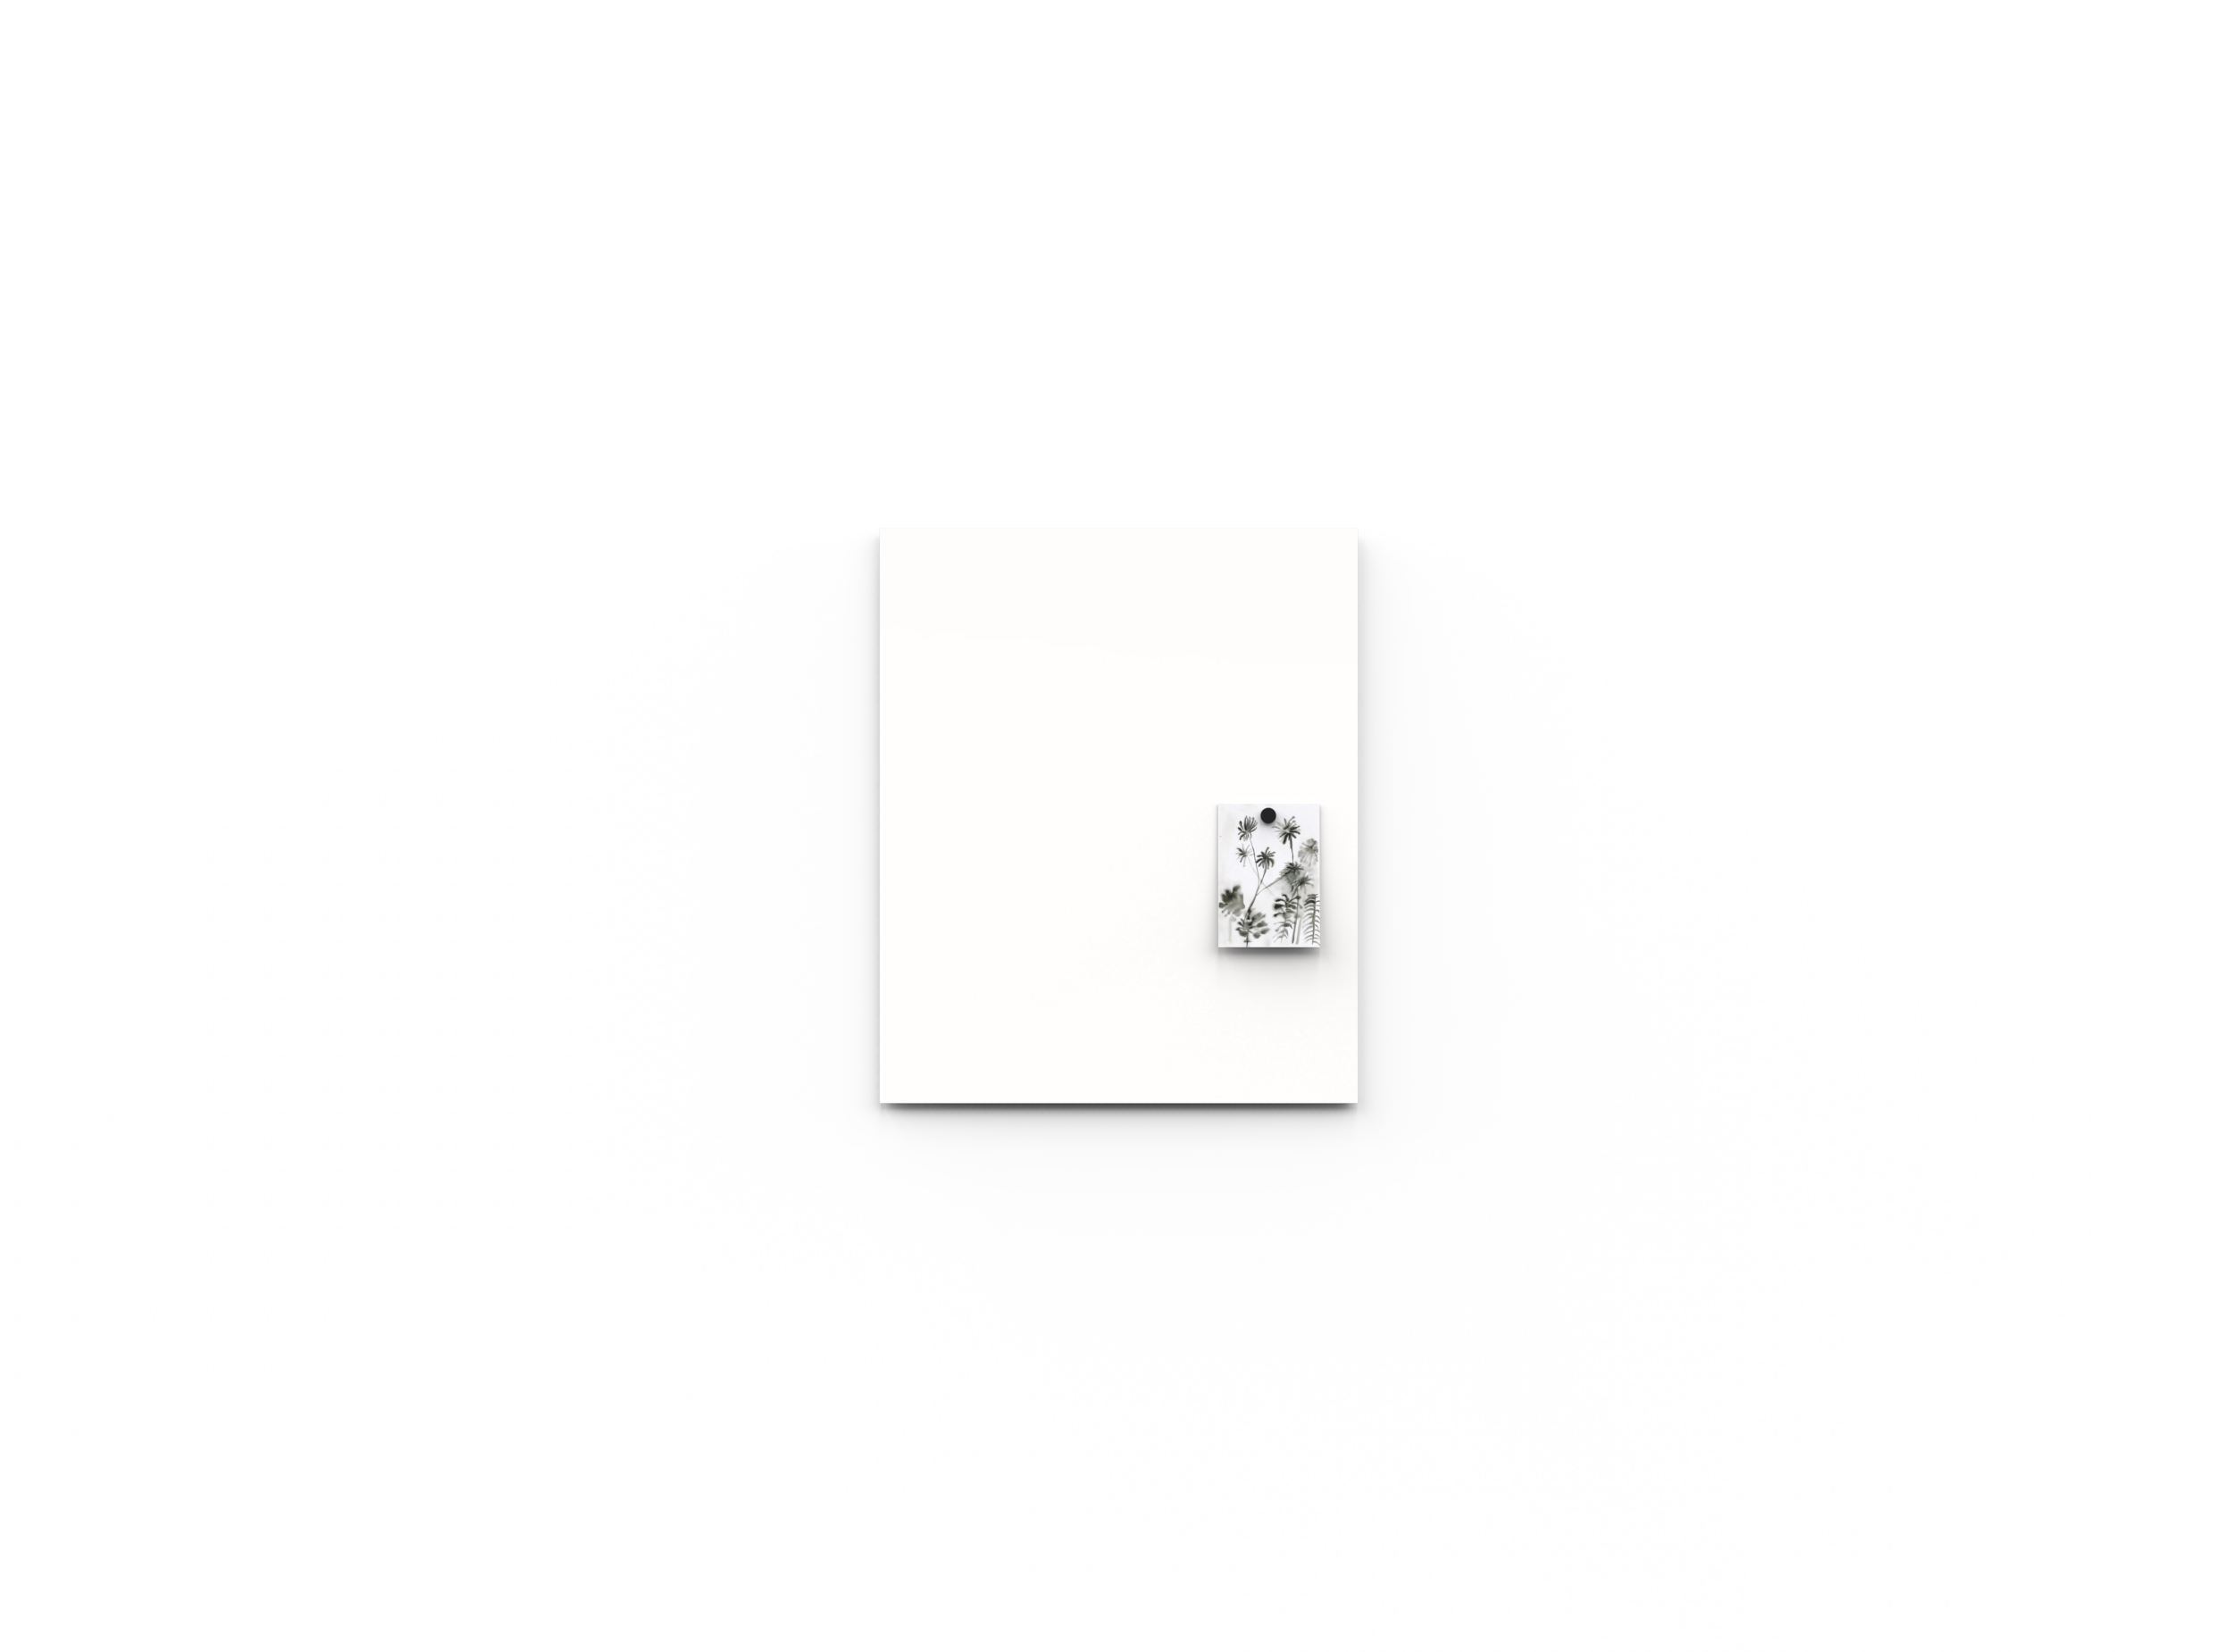 990 x 1190